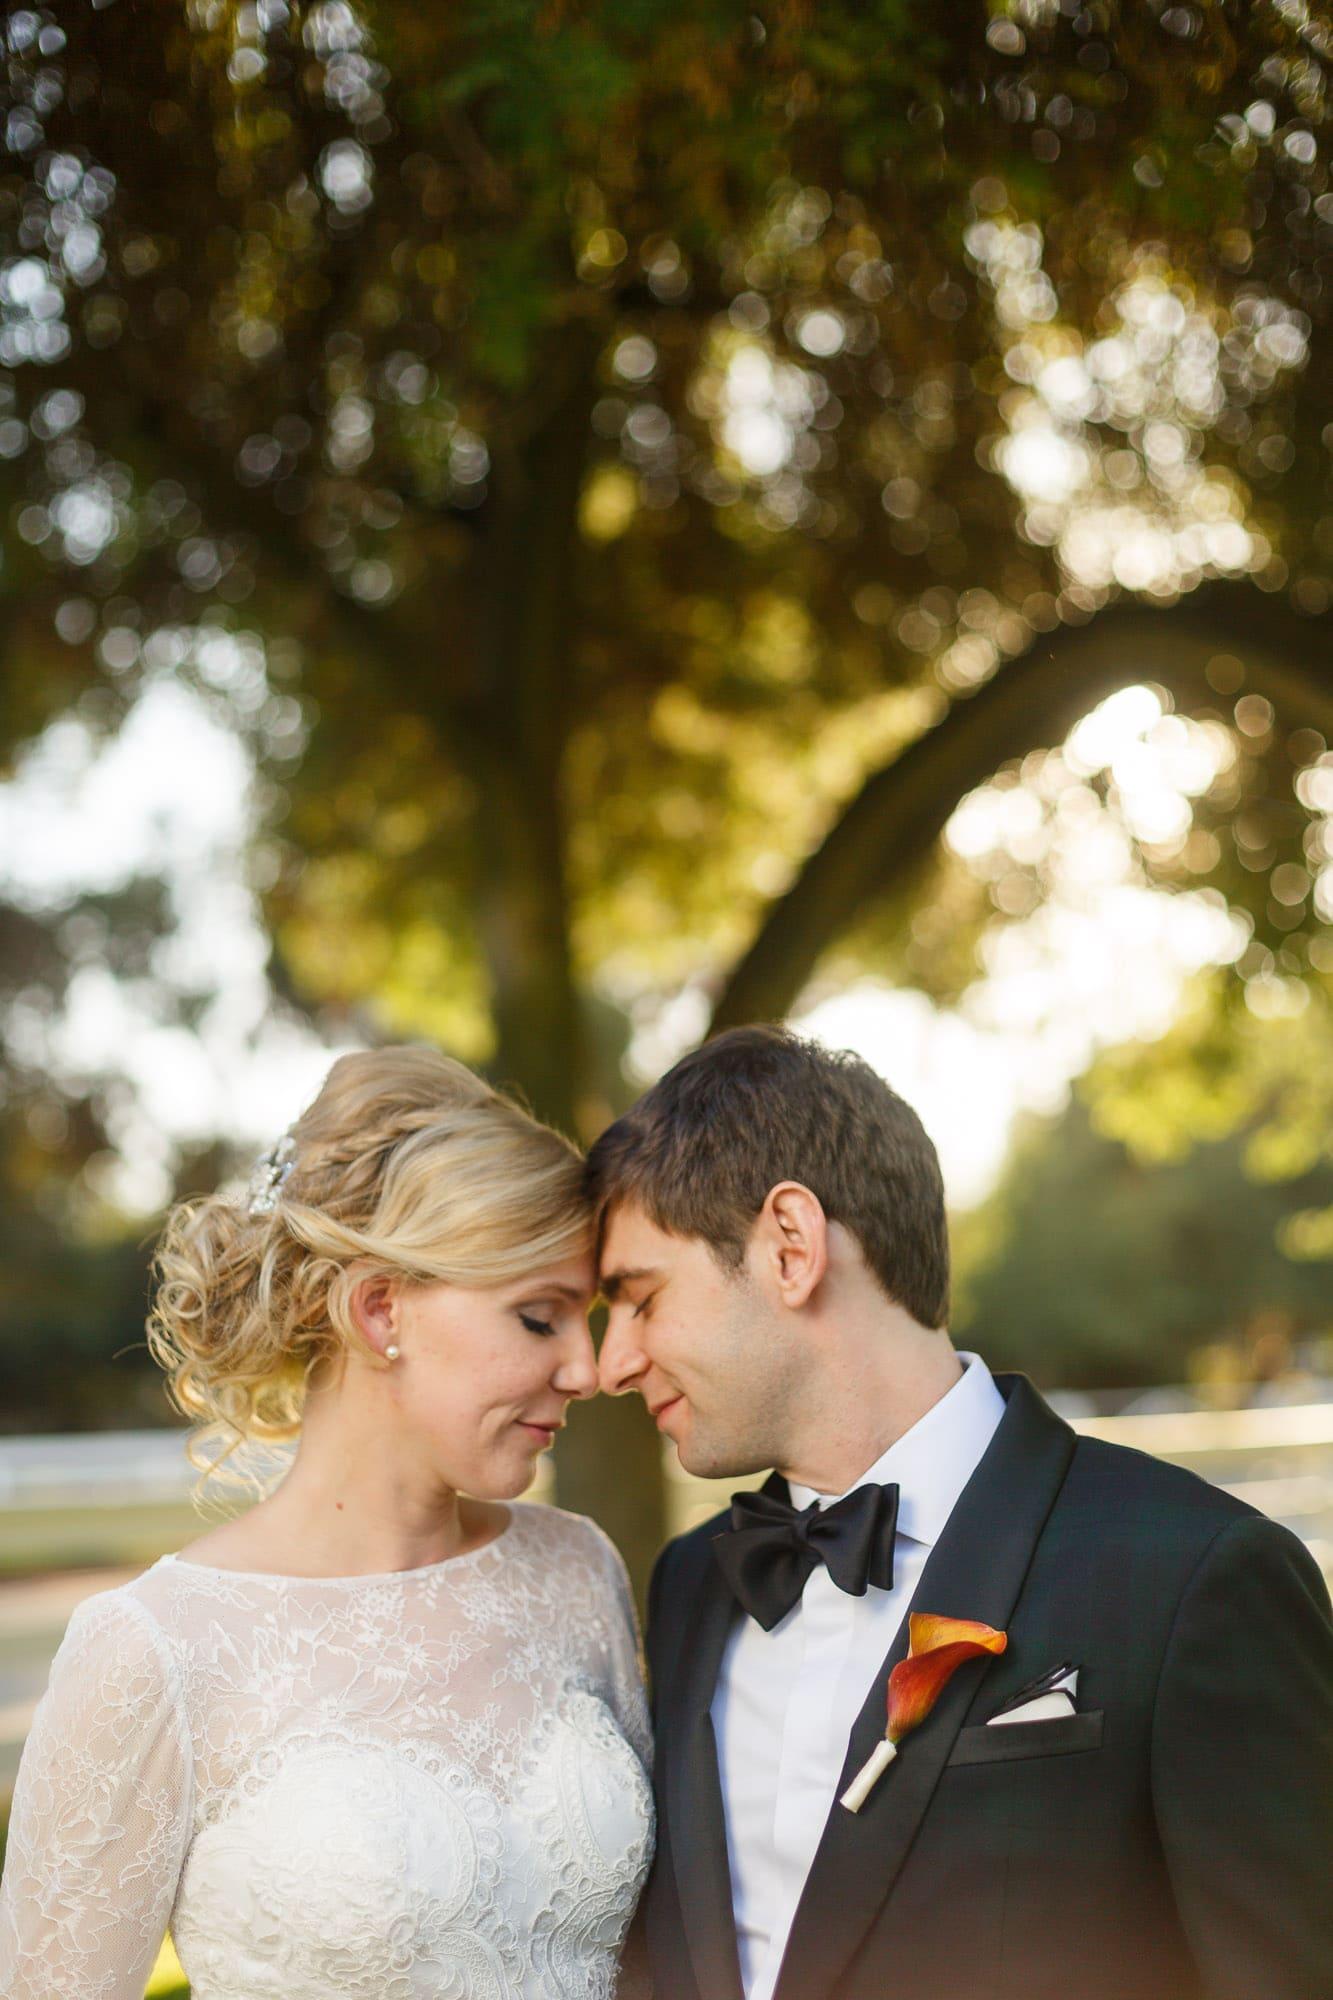 027_Alan_and_Heidi_Los_Angeles_Equestrian_Center_Wedding